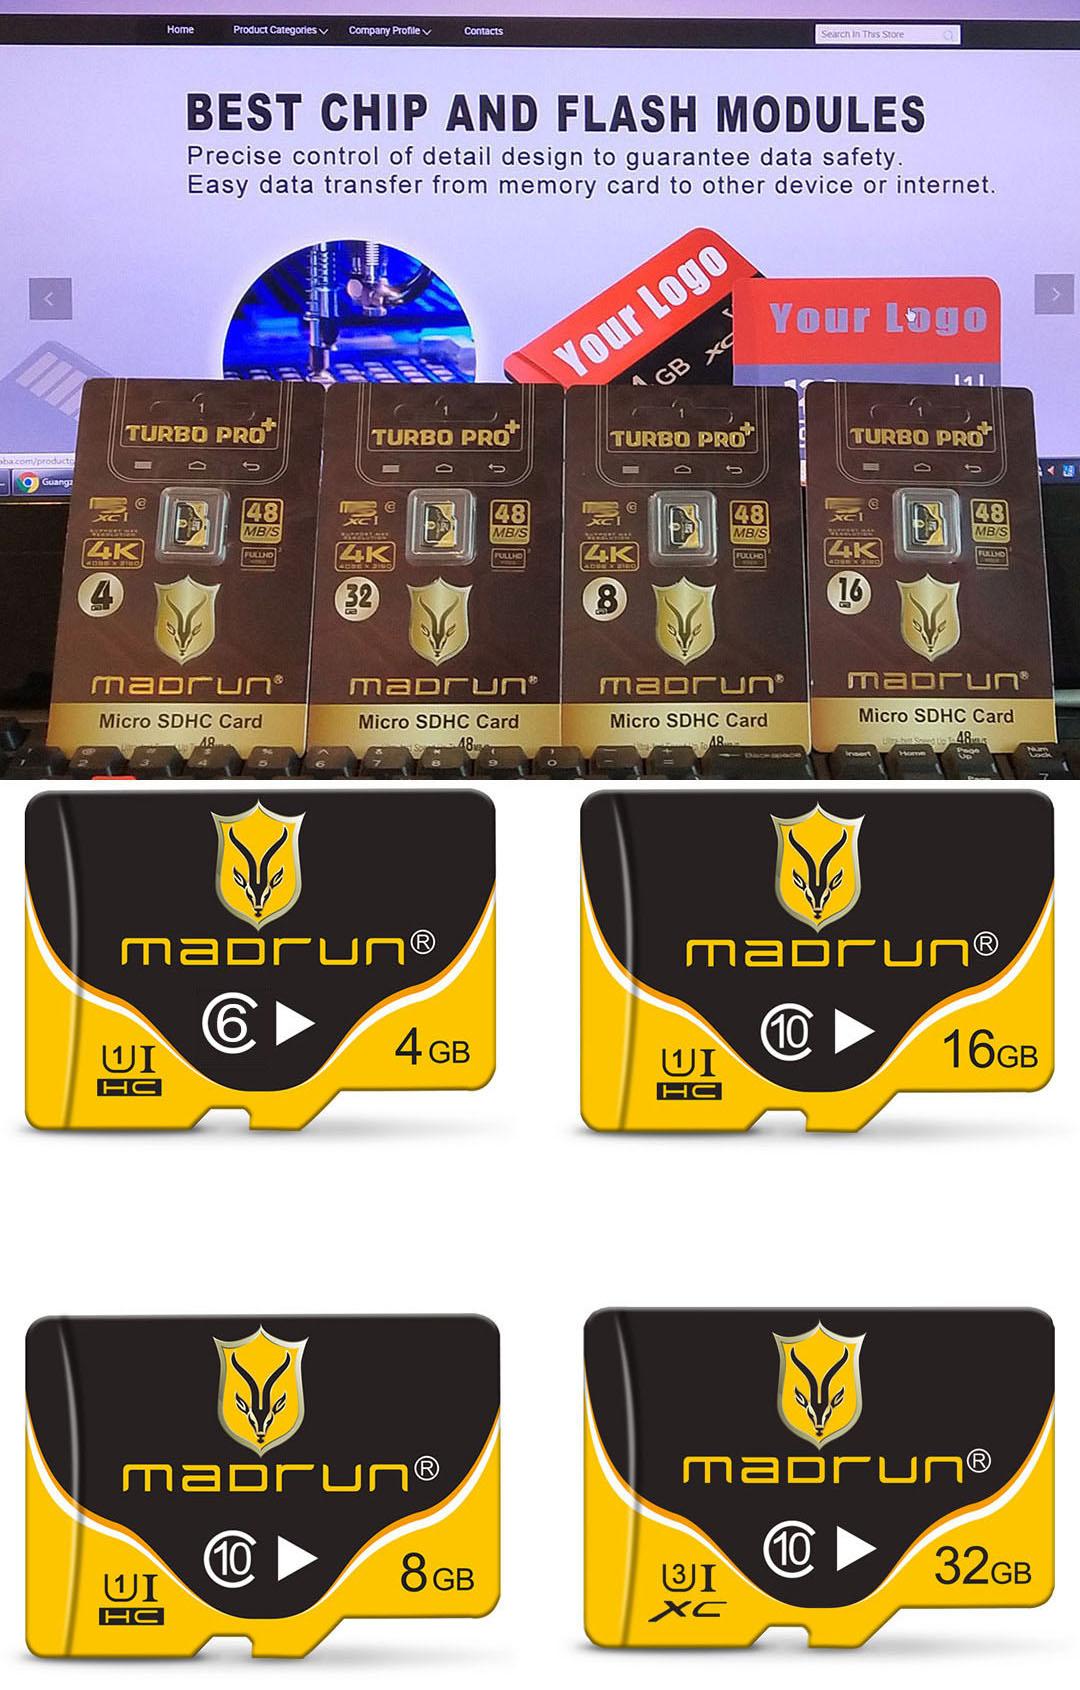 Asli Kelas Kartu Tf Sd Mikro Kartu Memori 1 GB 2 GB 4 GB 8 Gb 16 GB 32 GB 64 GB 128 GB 256 GB Penuh Real Capacity Micro Memory Card